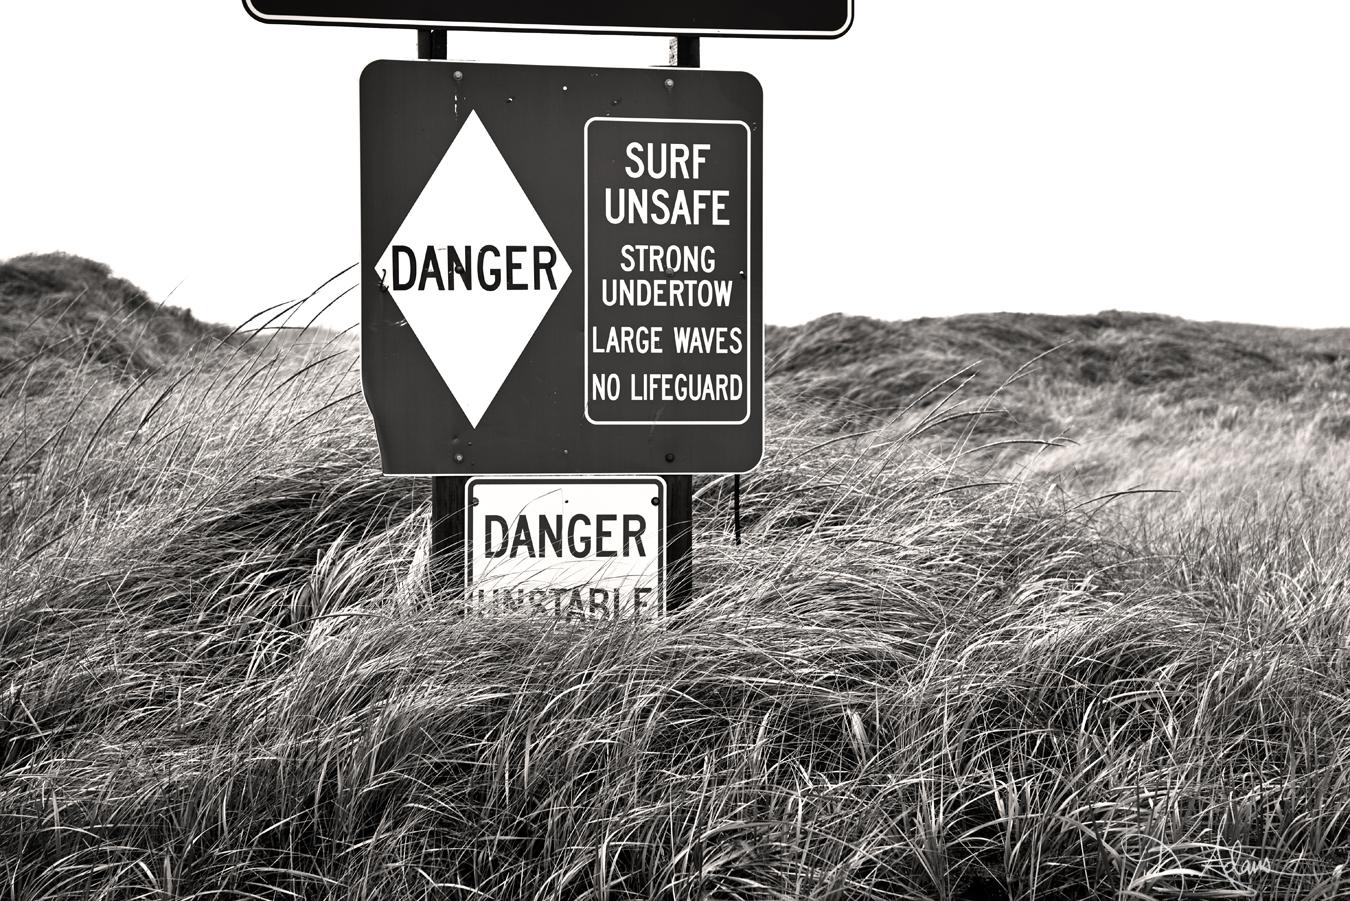 Surf Unsafe